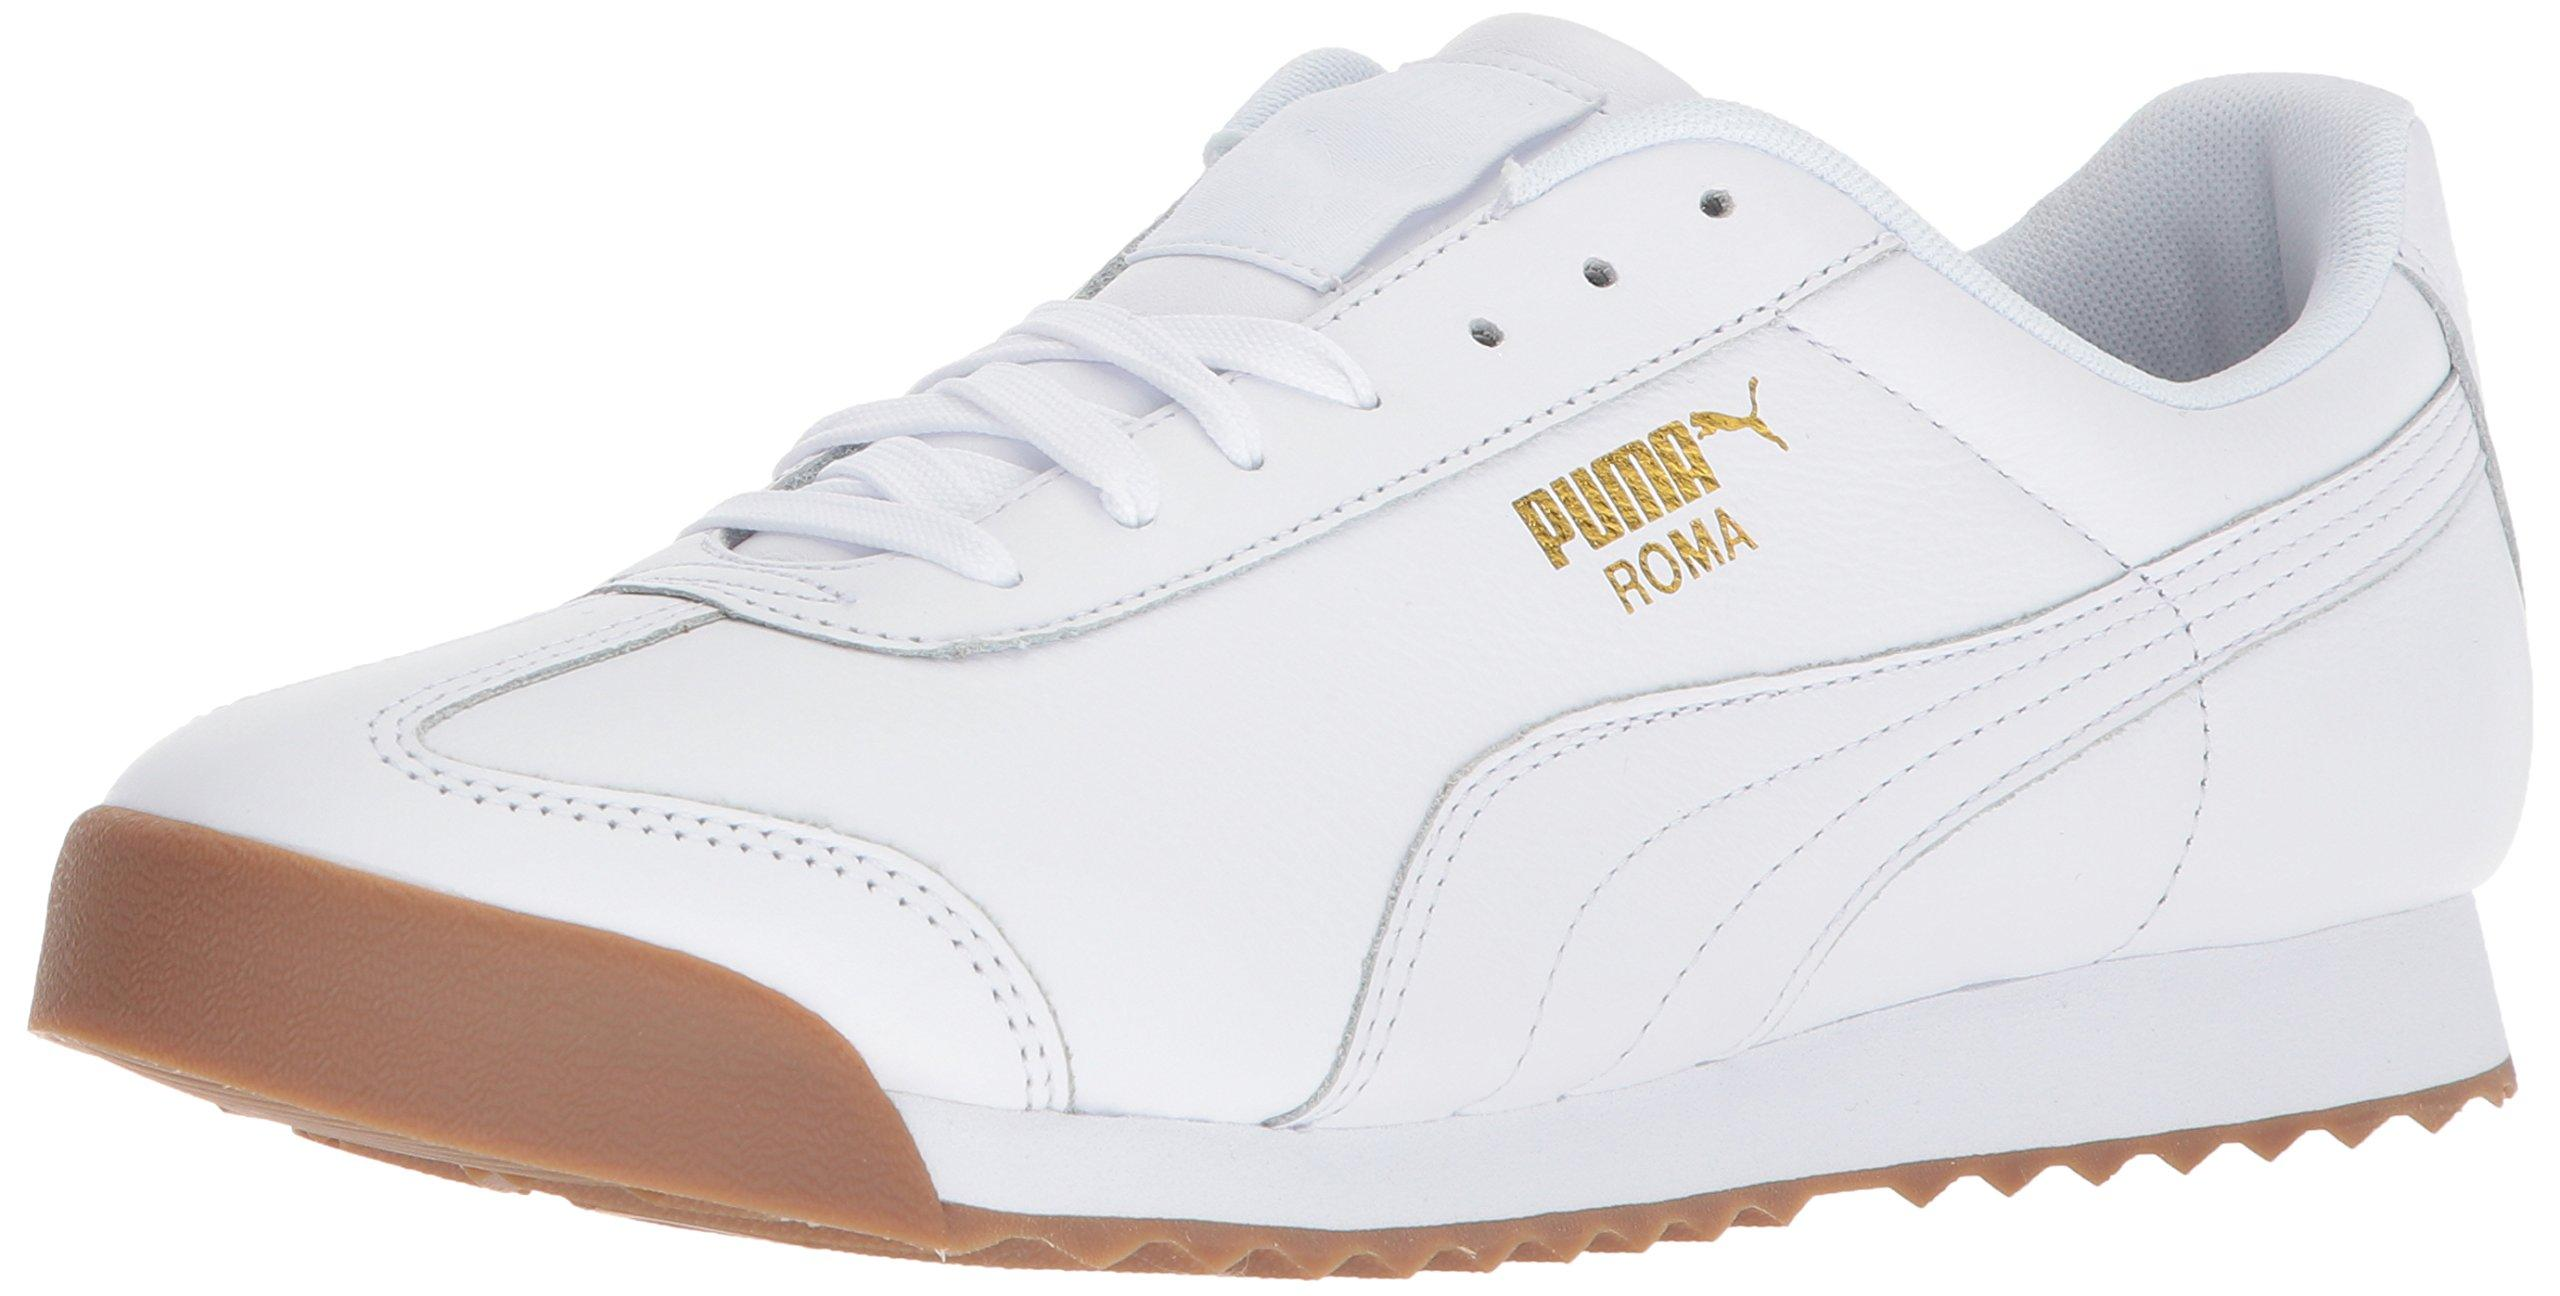 PUMA Leather Roma Classic Gum in White